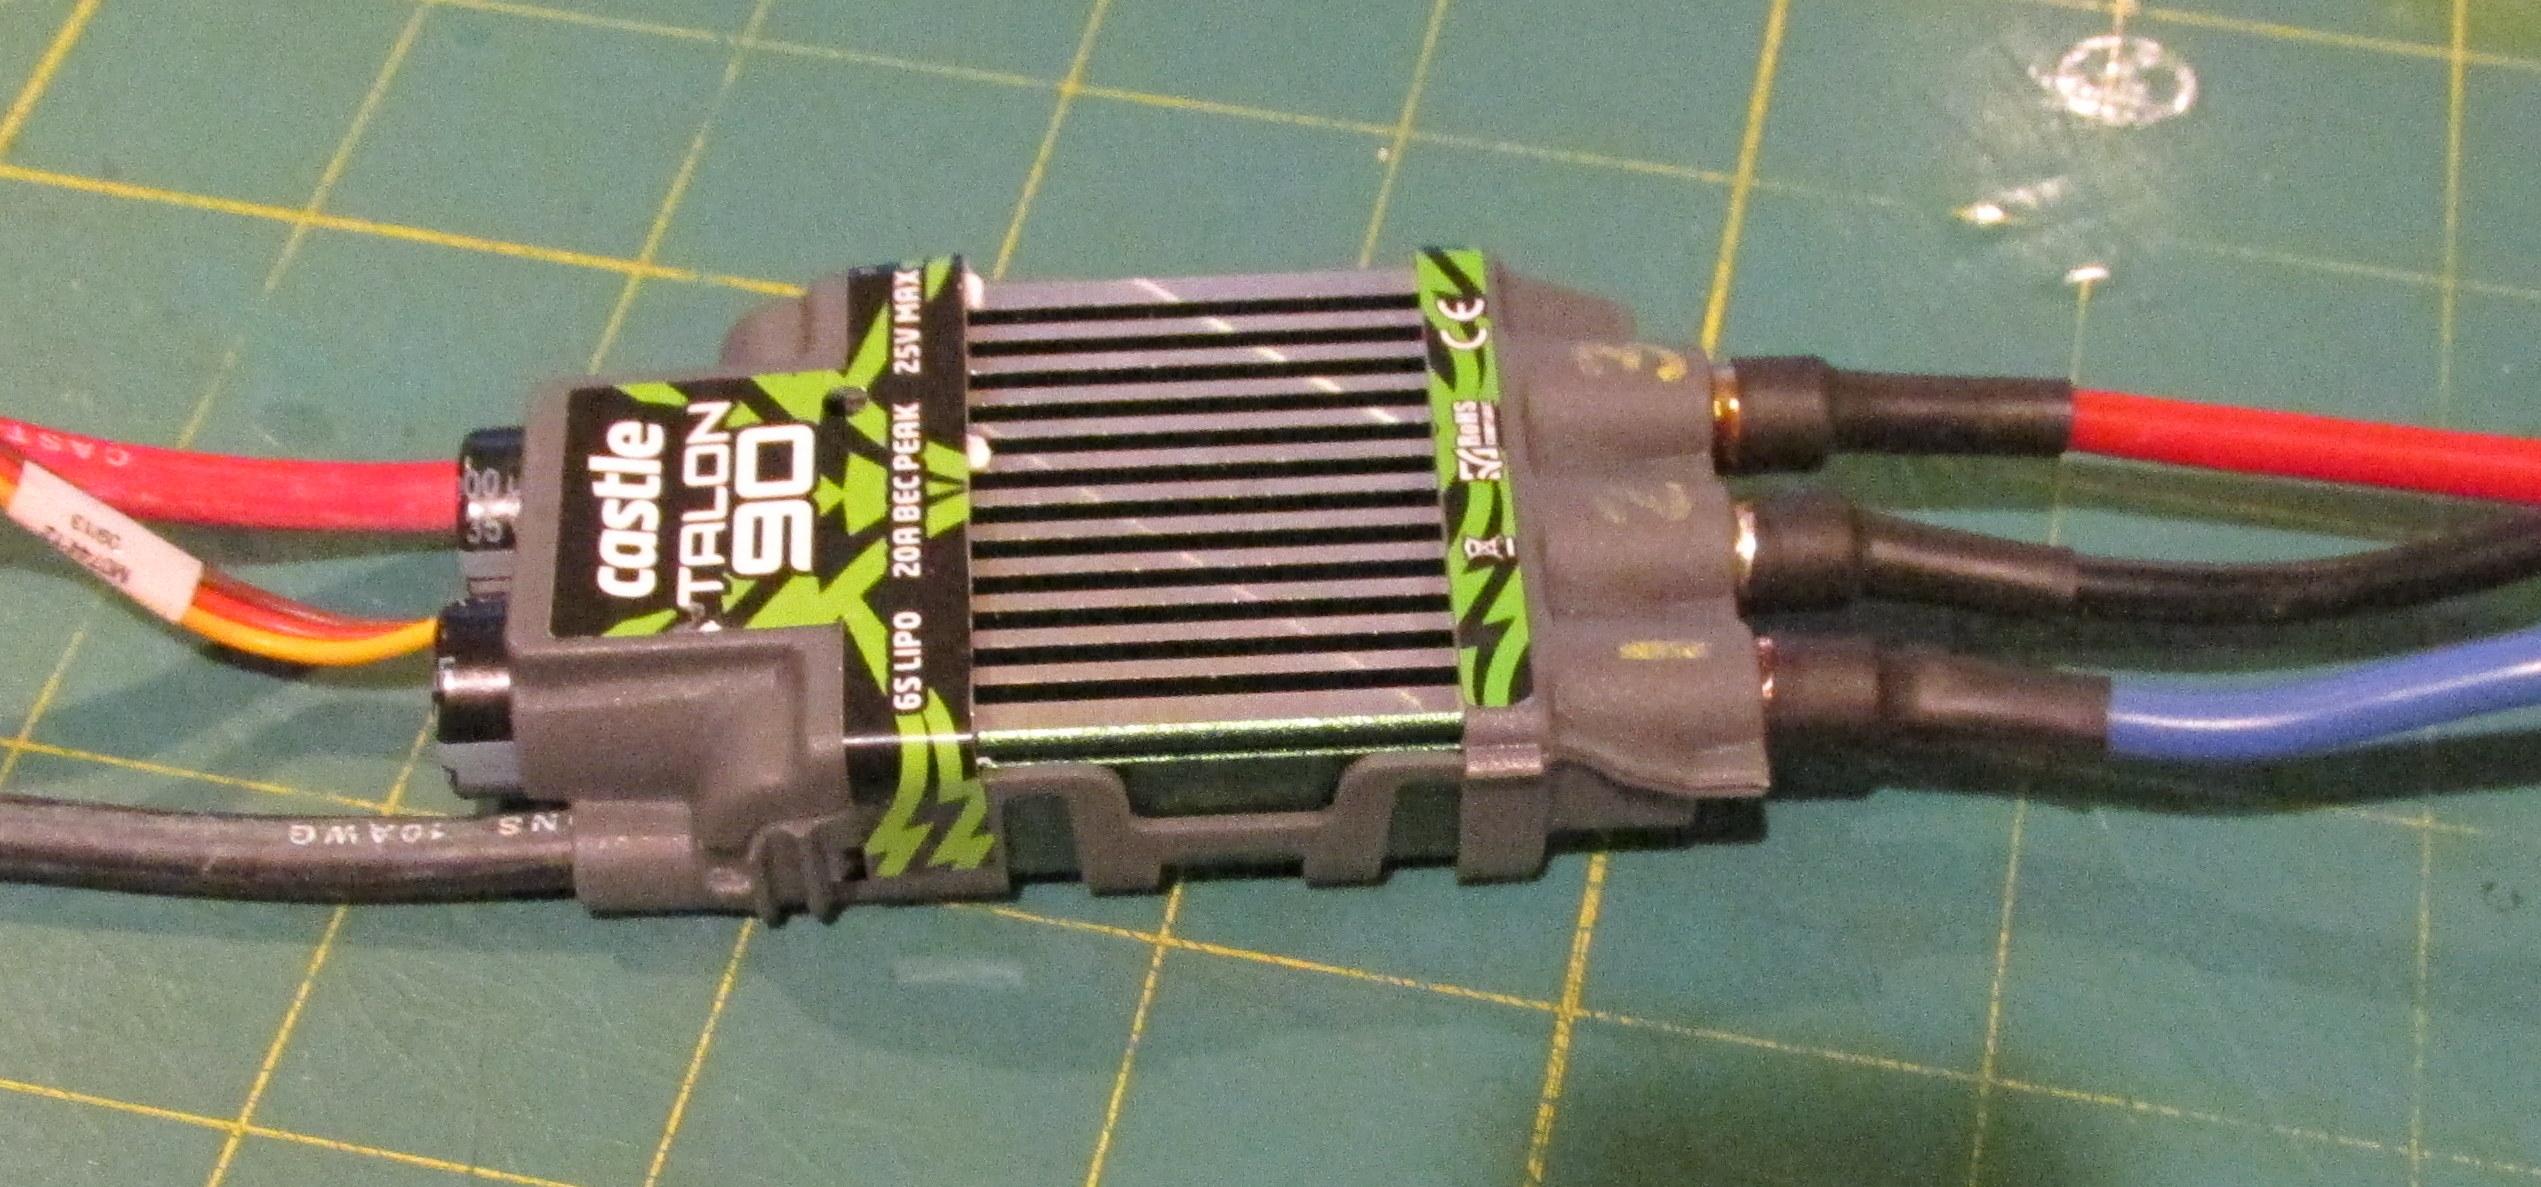 Brushed Motor Wiring Diagram Besides Rc Esc Wiring Diagram As Well